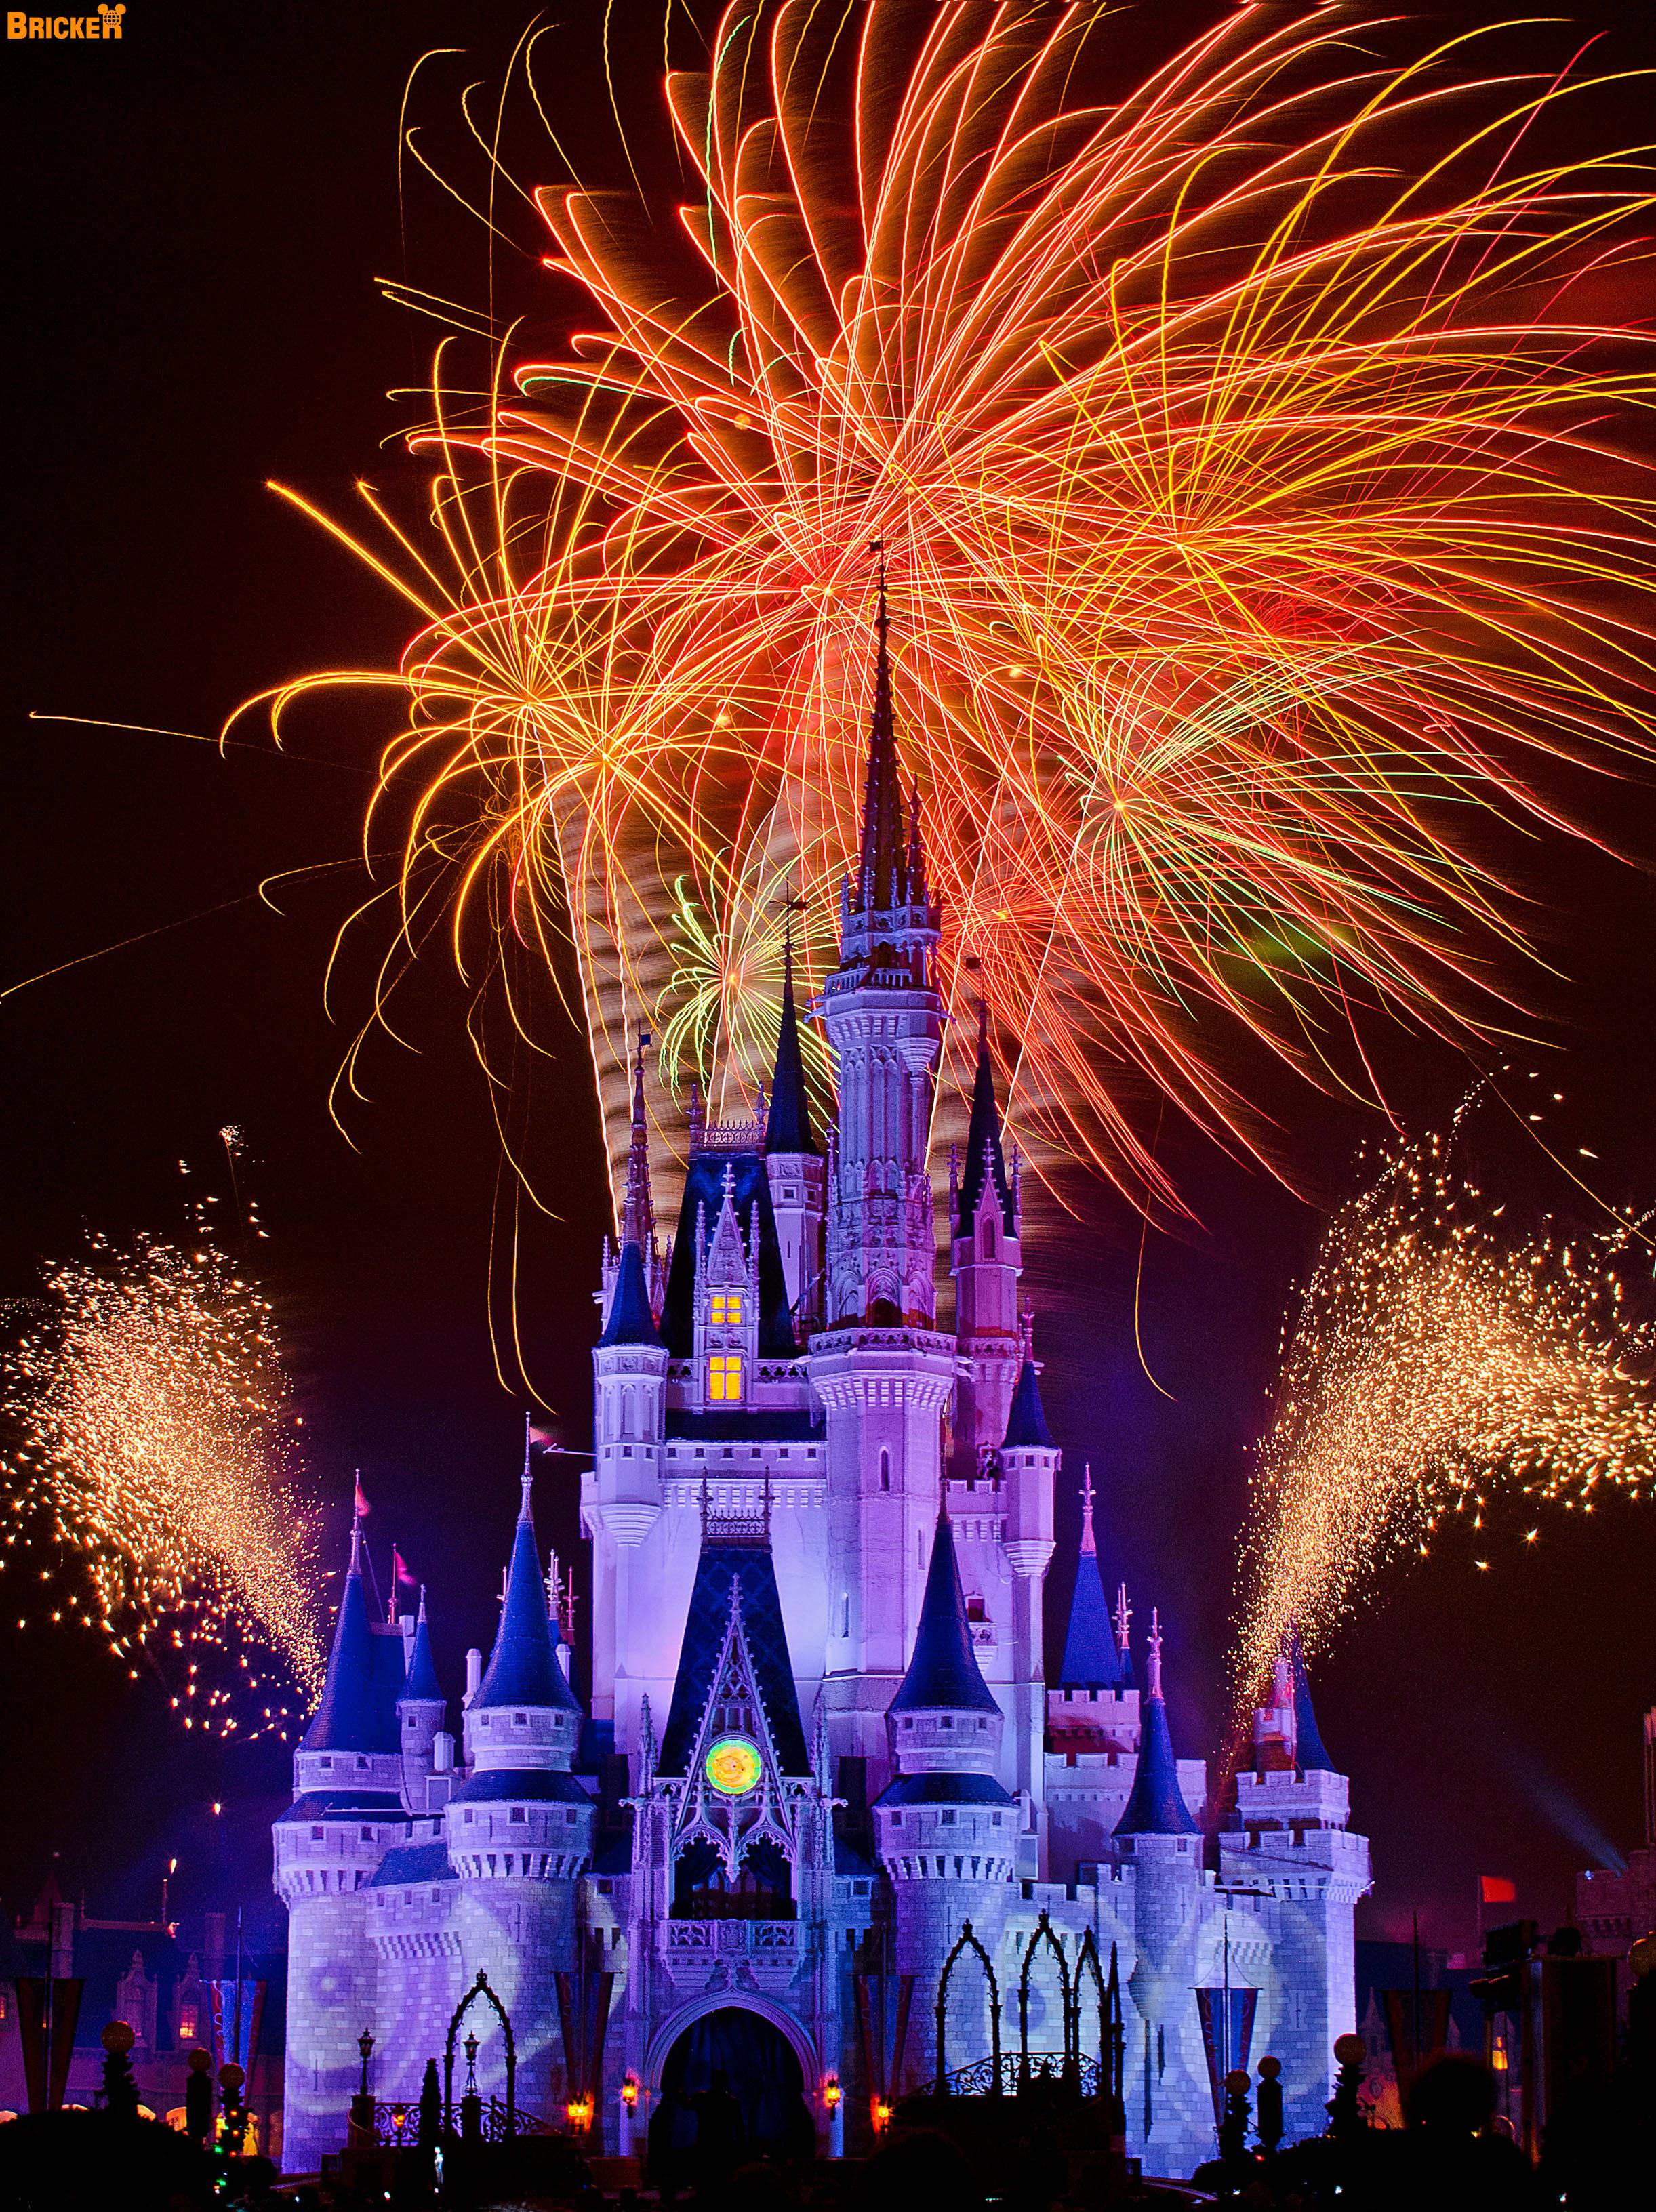 40 awesometacular fireworks photos disney tourist blog